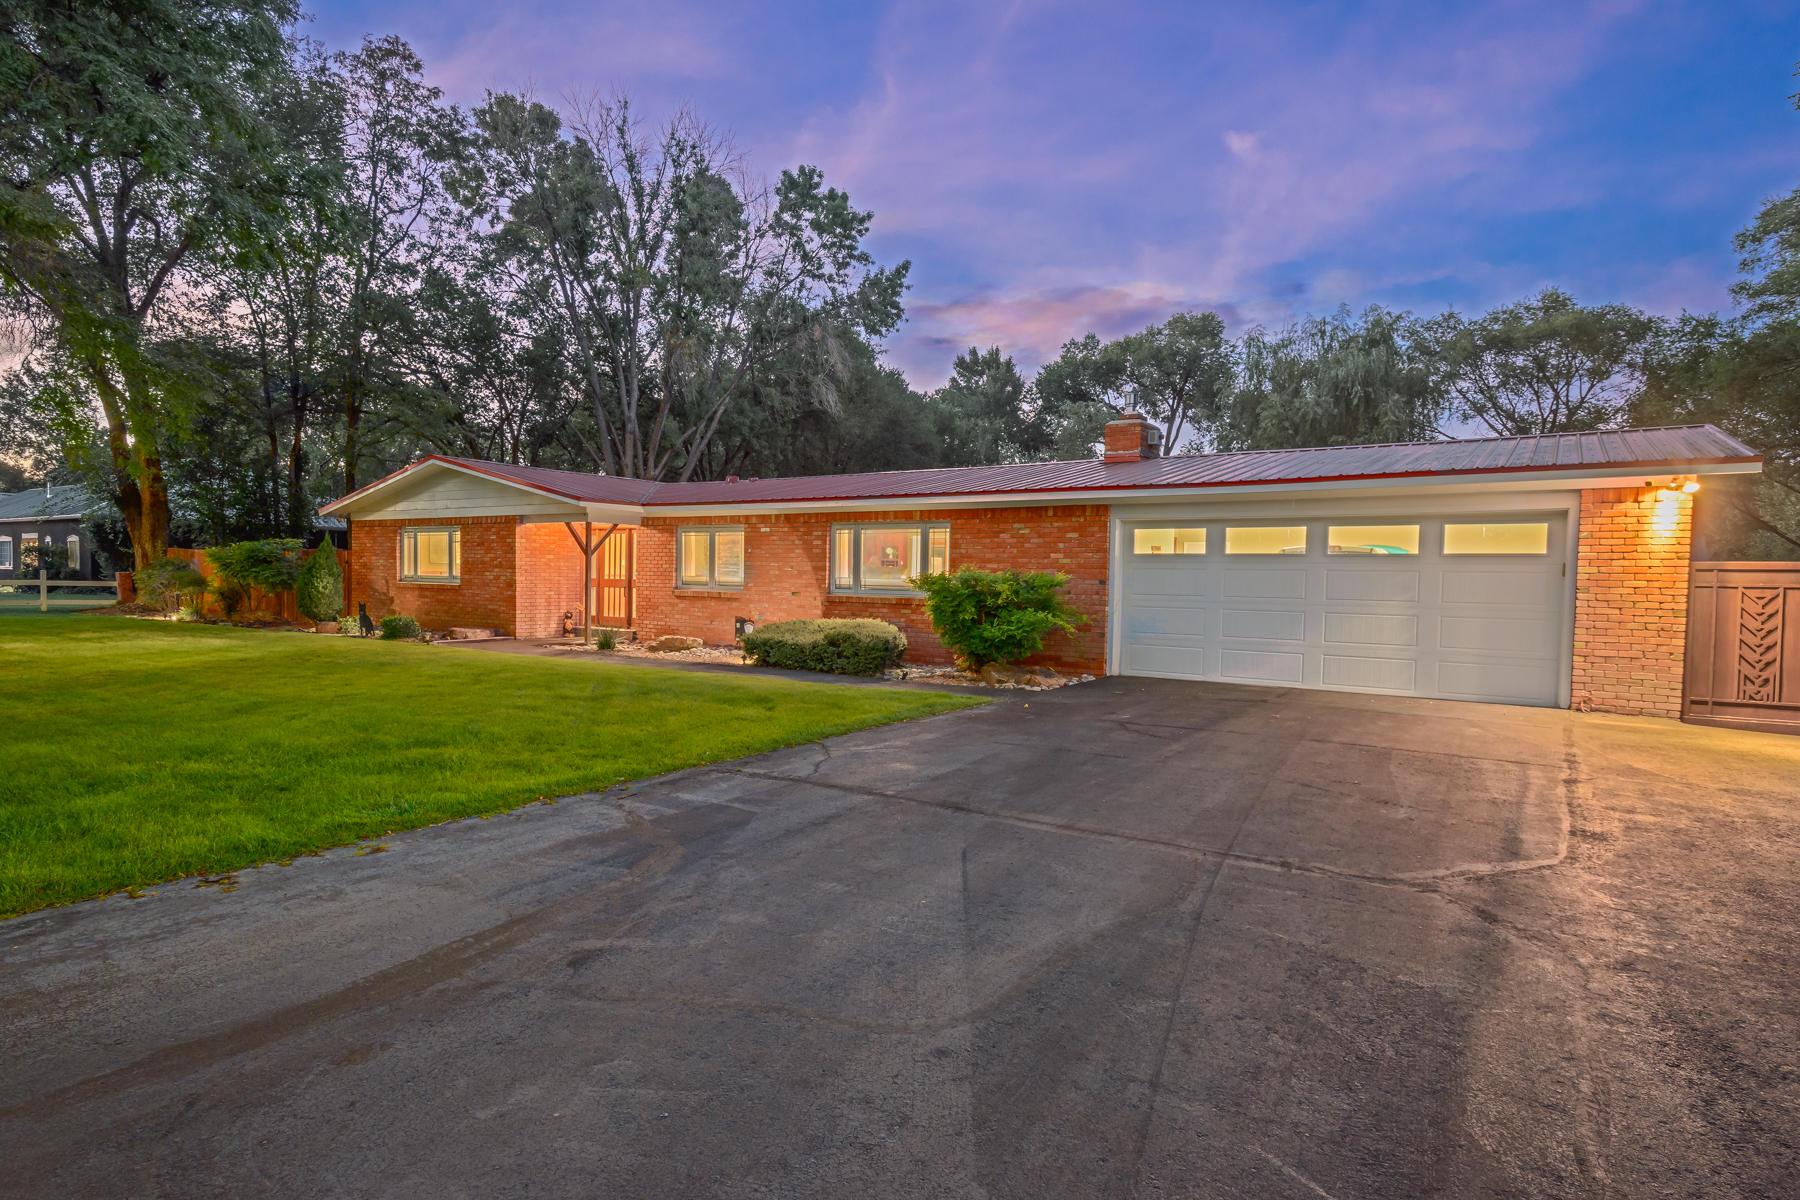 415 CAMINO DEL BOSQUE NW Property Photo - Albuquerque, NM real estate listing